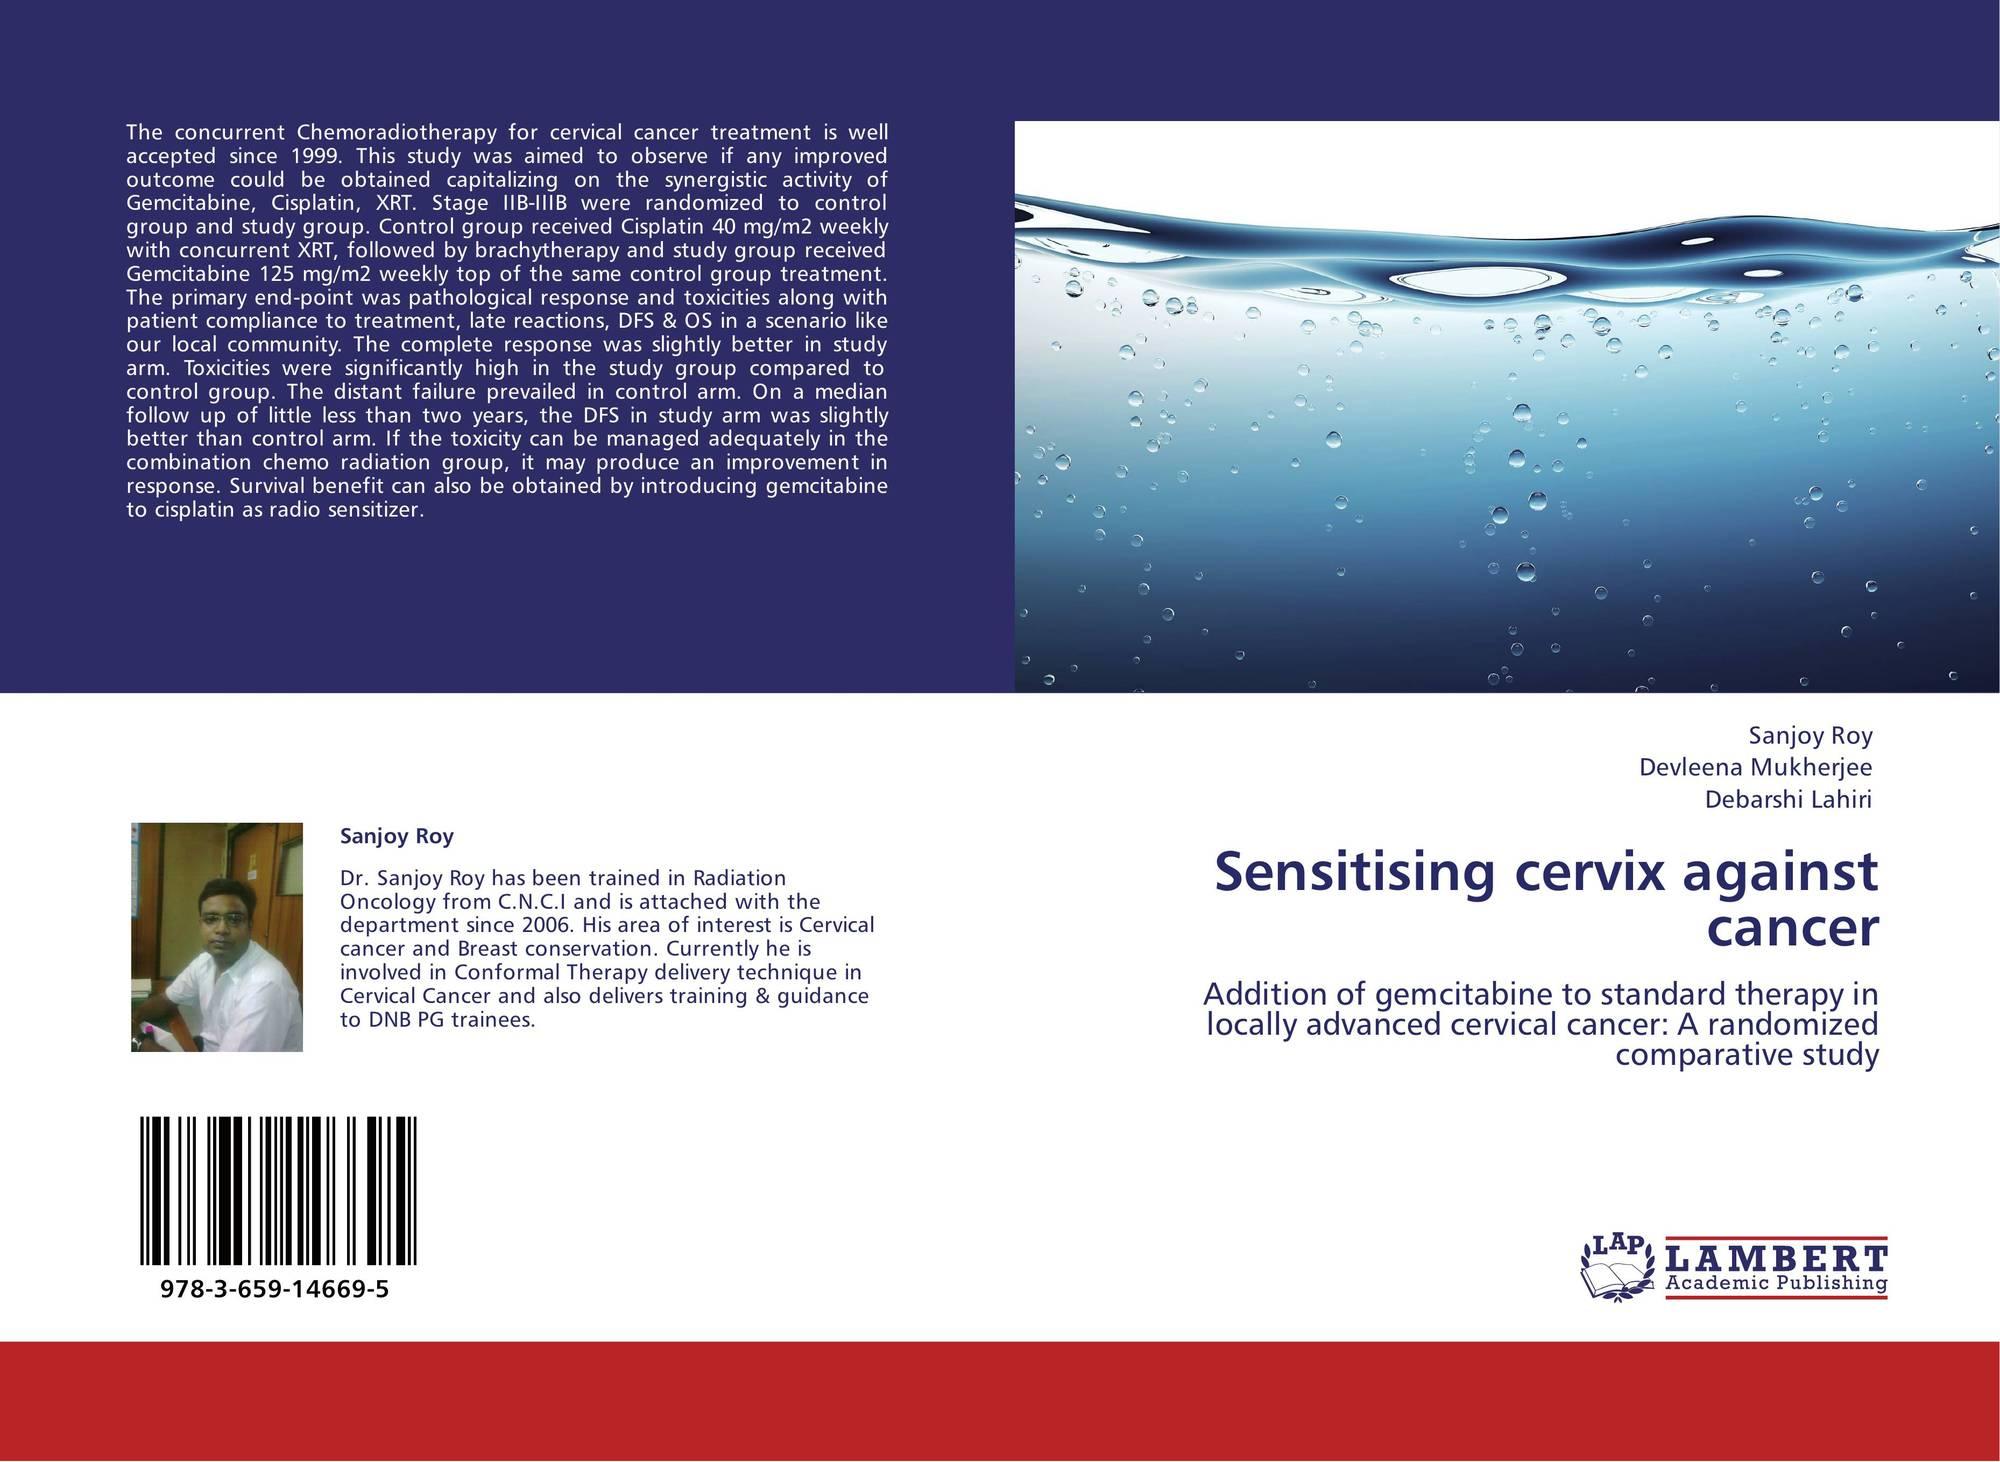 Sensitising cervix against cancer, 978-3-659-14669-5